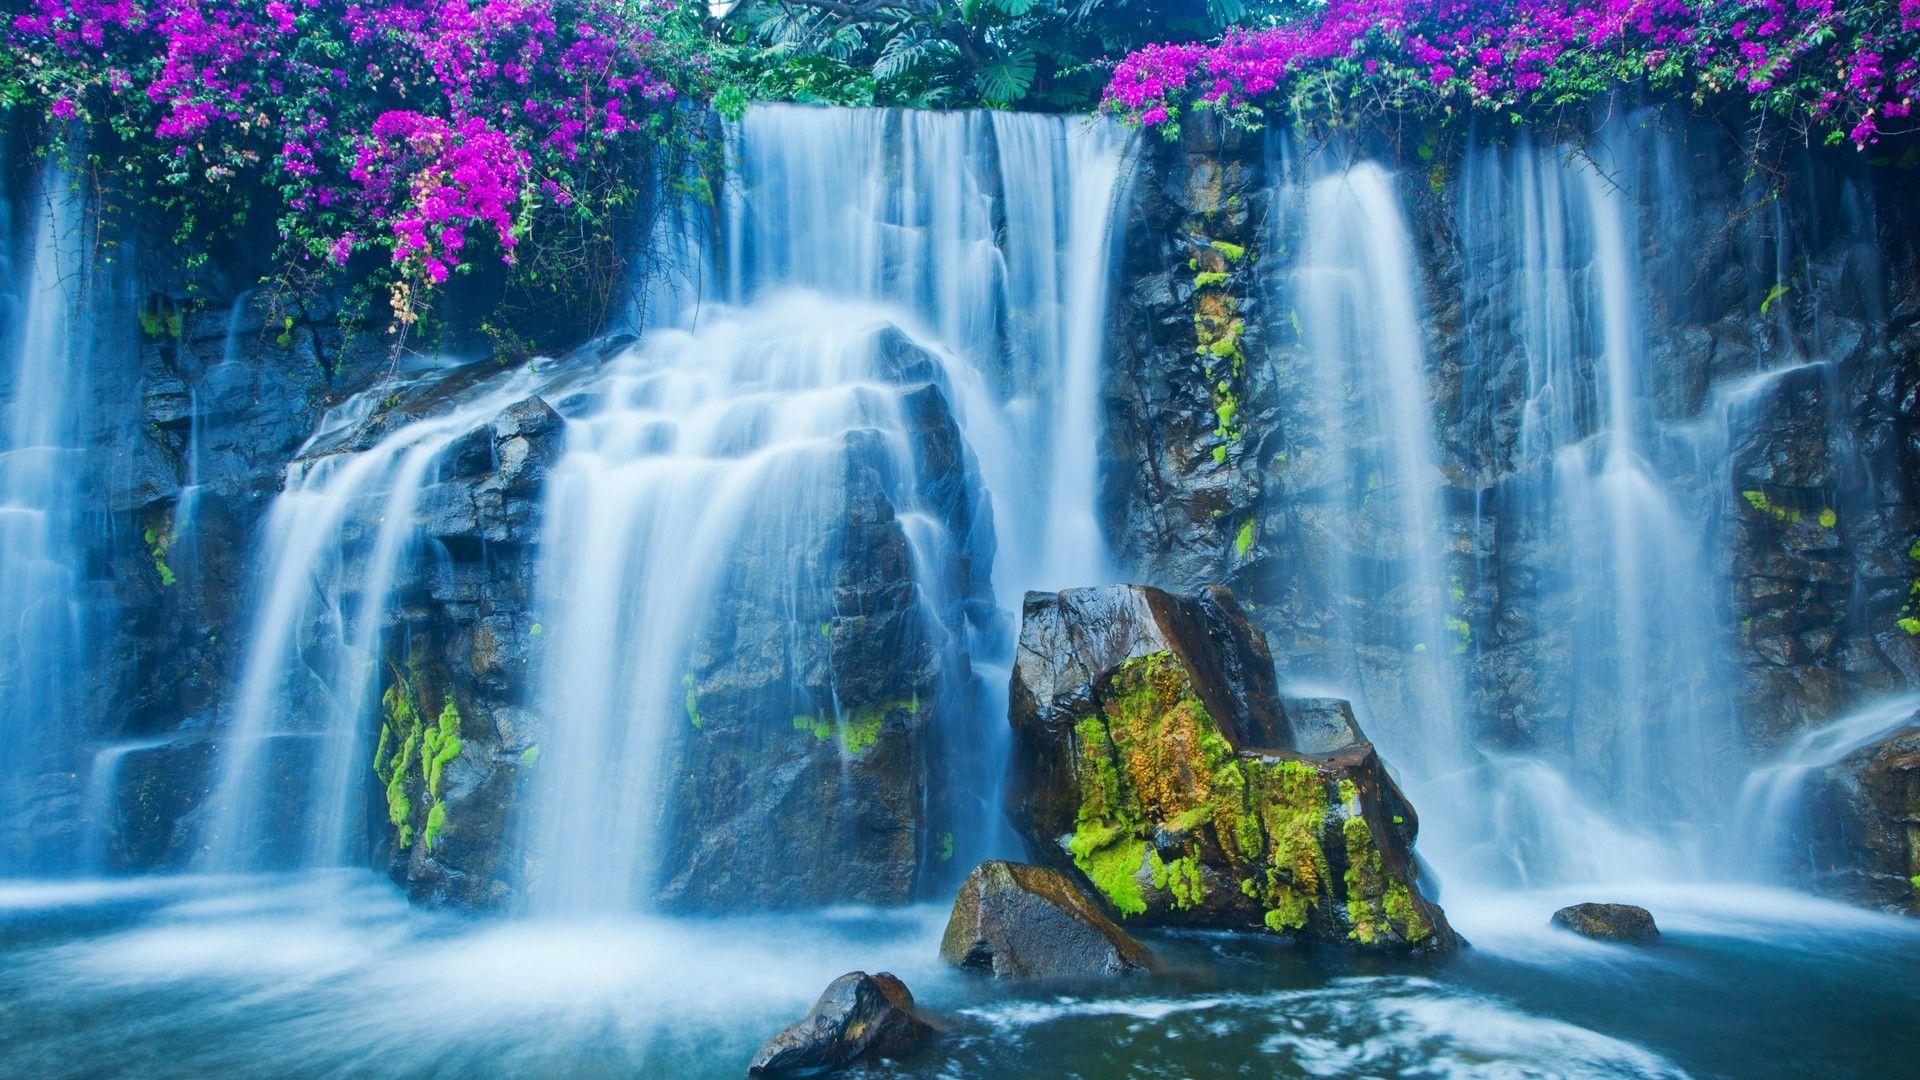 Waterfalls 1920x1080 Waterfall Photo Waterfall Wallpaper Waterfall